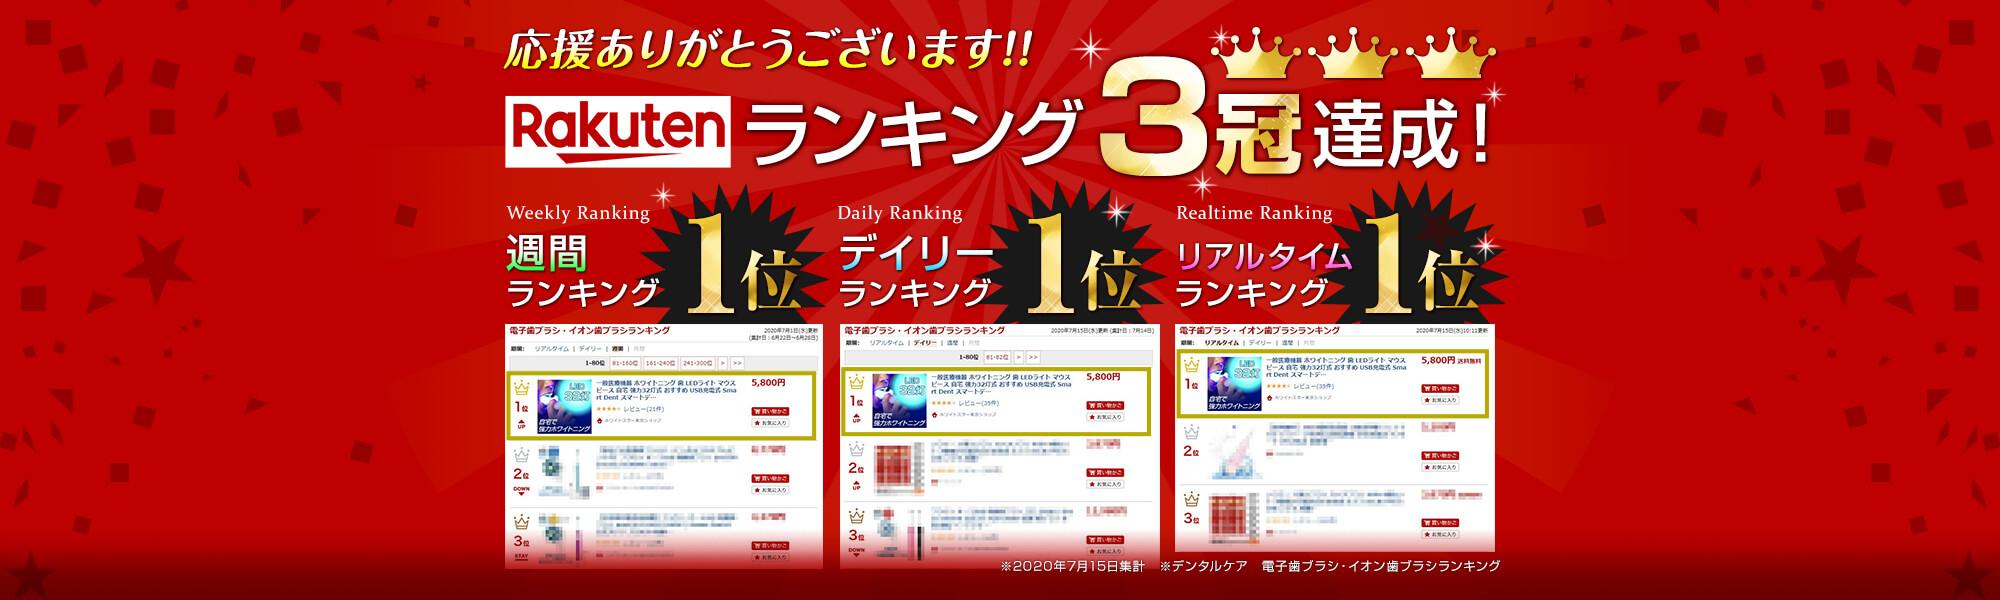 RAKUTENランキング3冠達成!